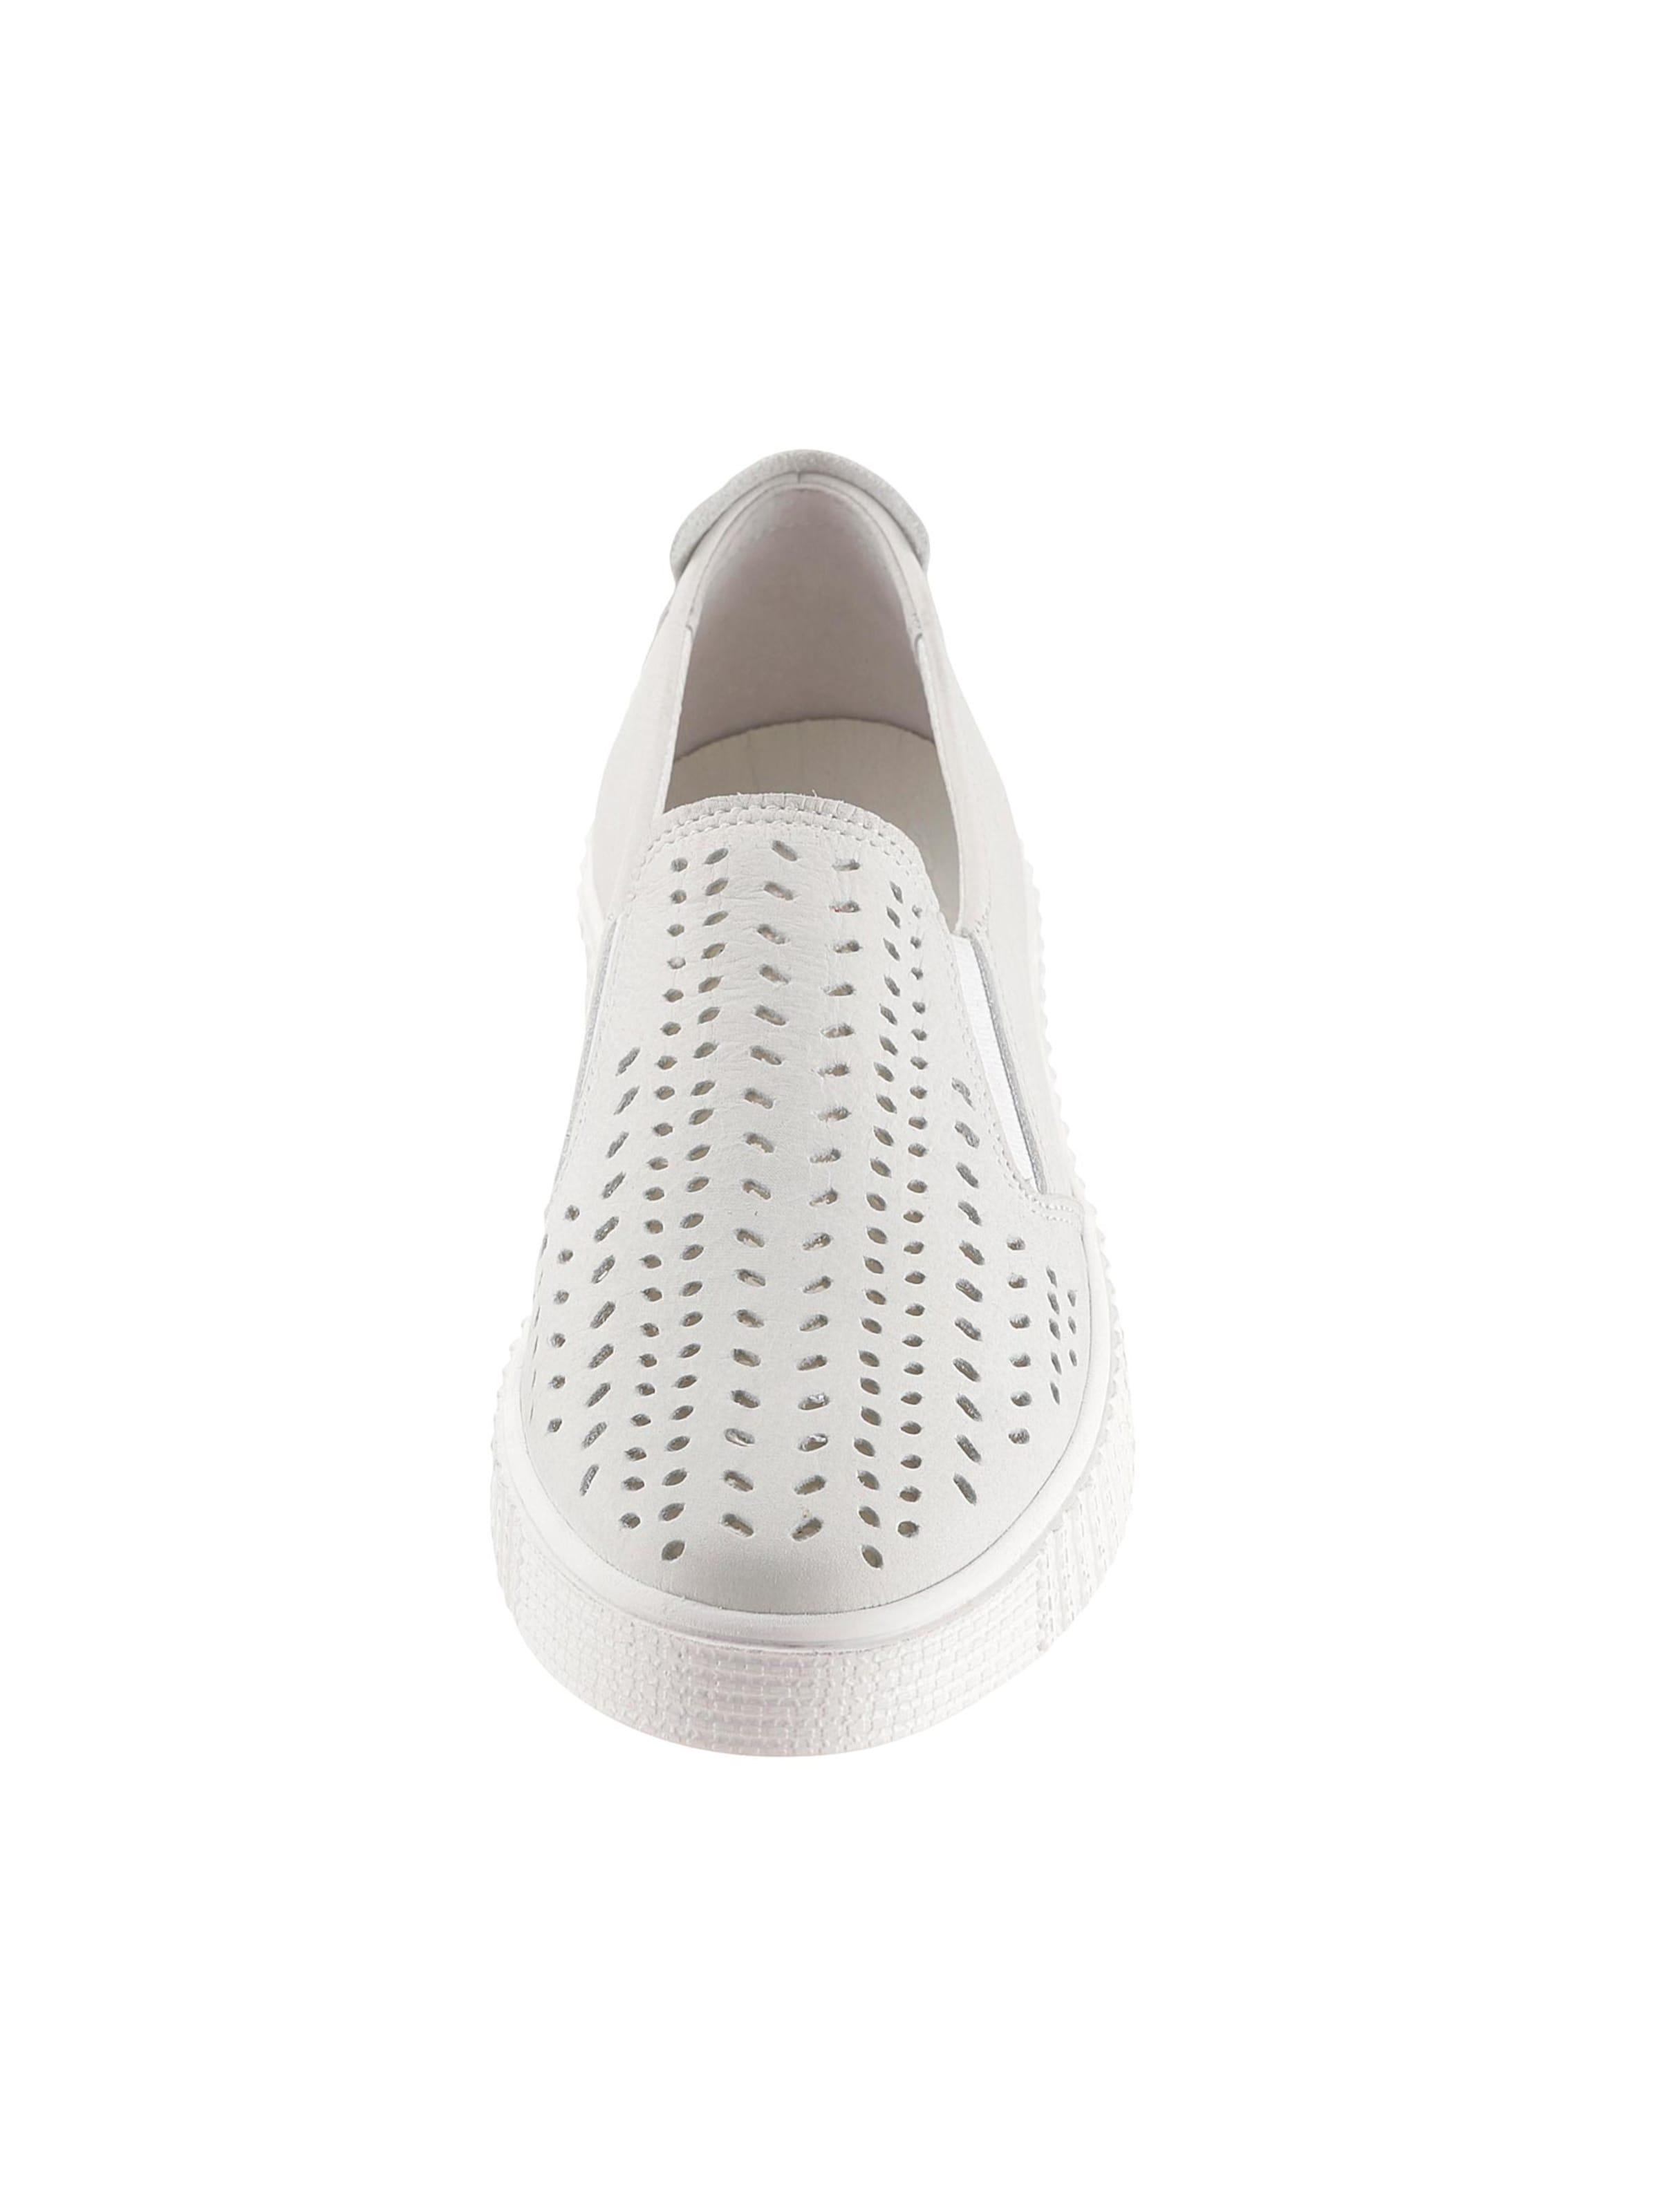 rd-soft - Damen Slipper weiß